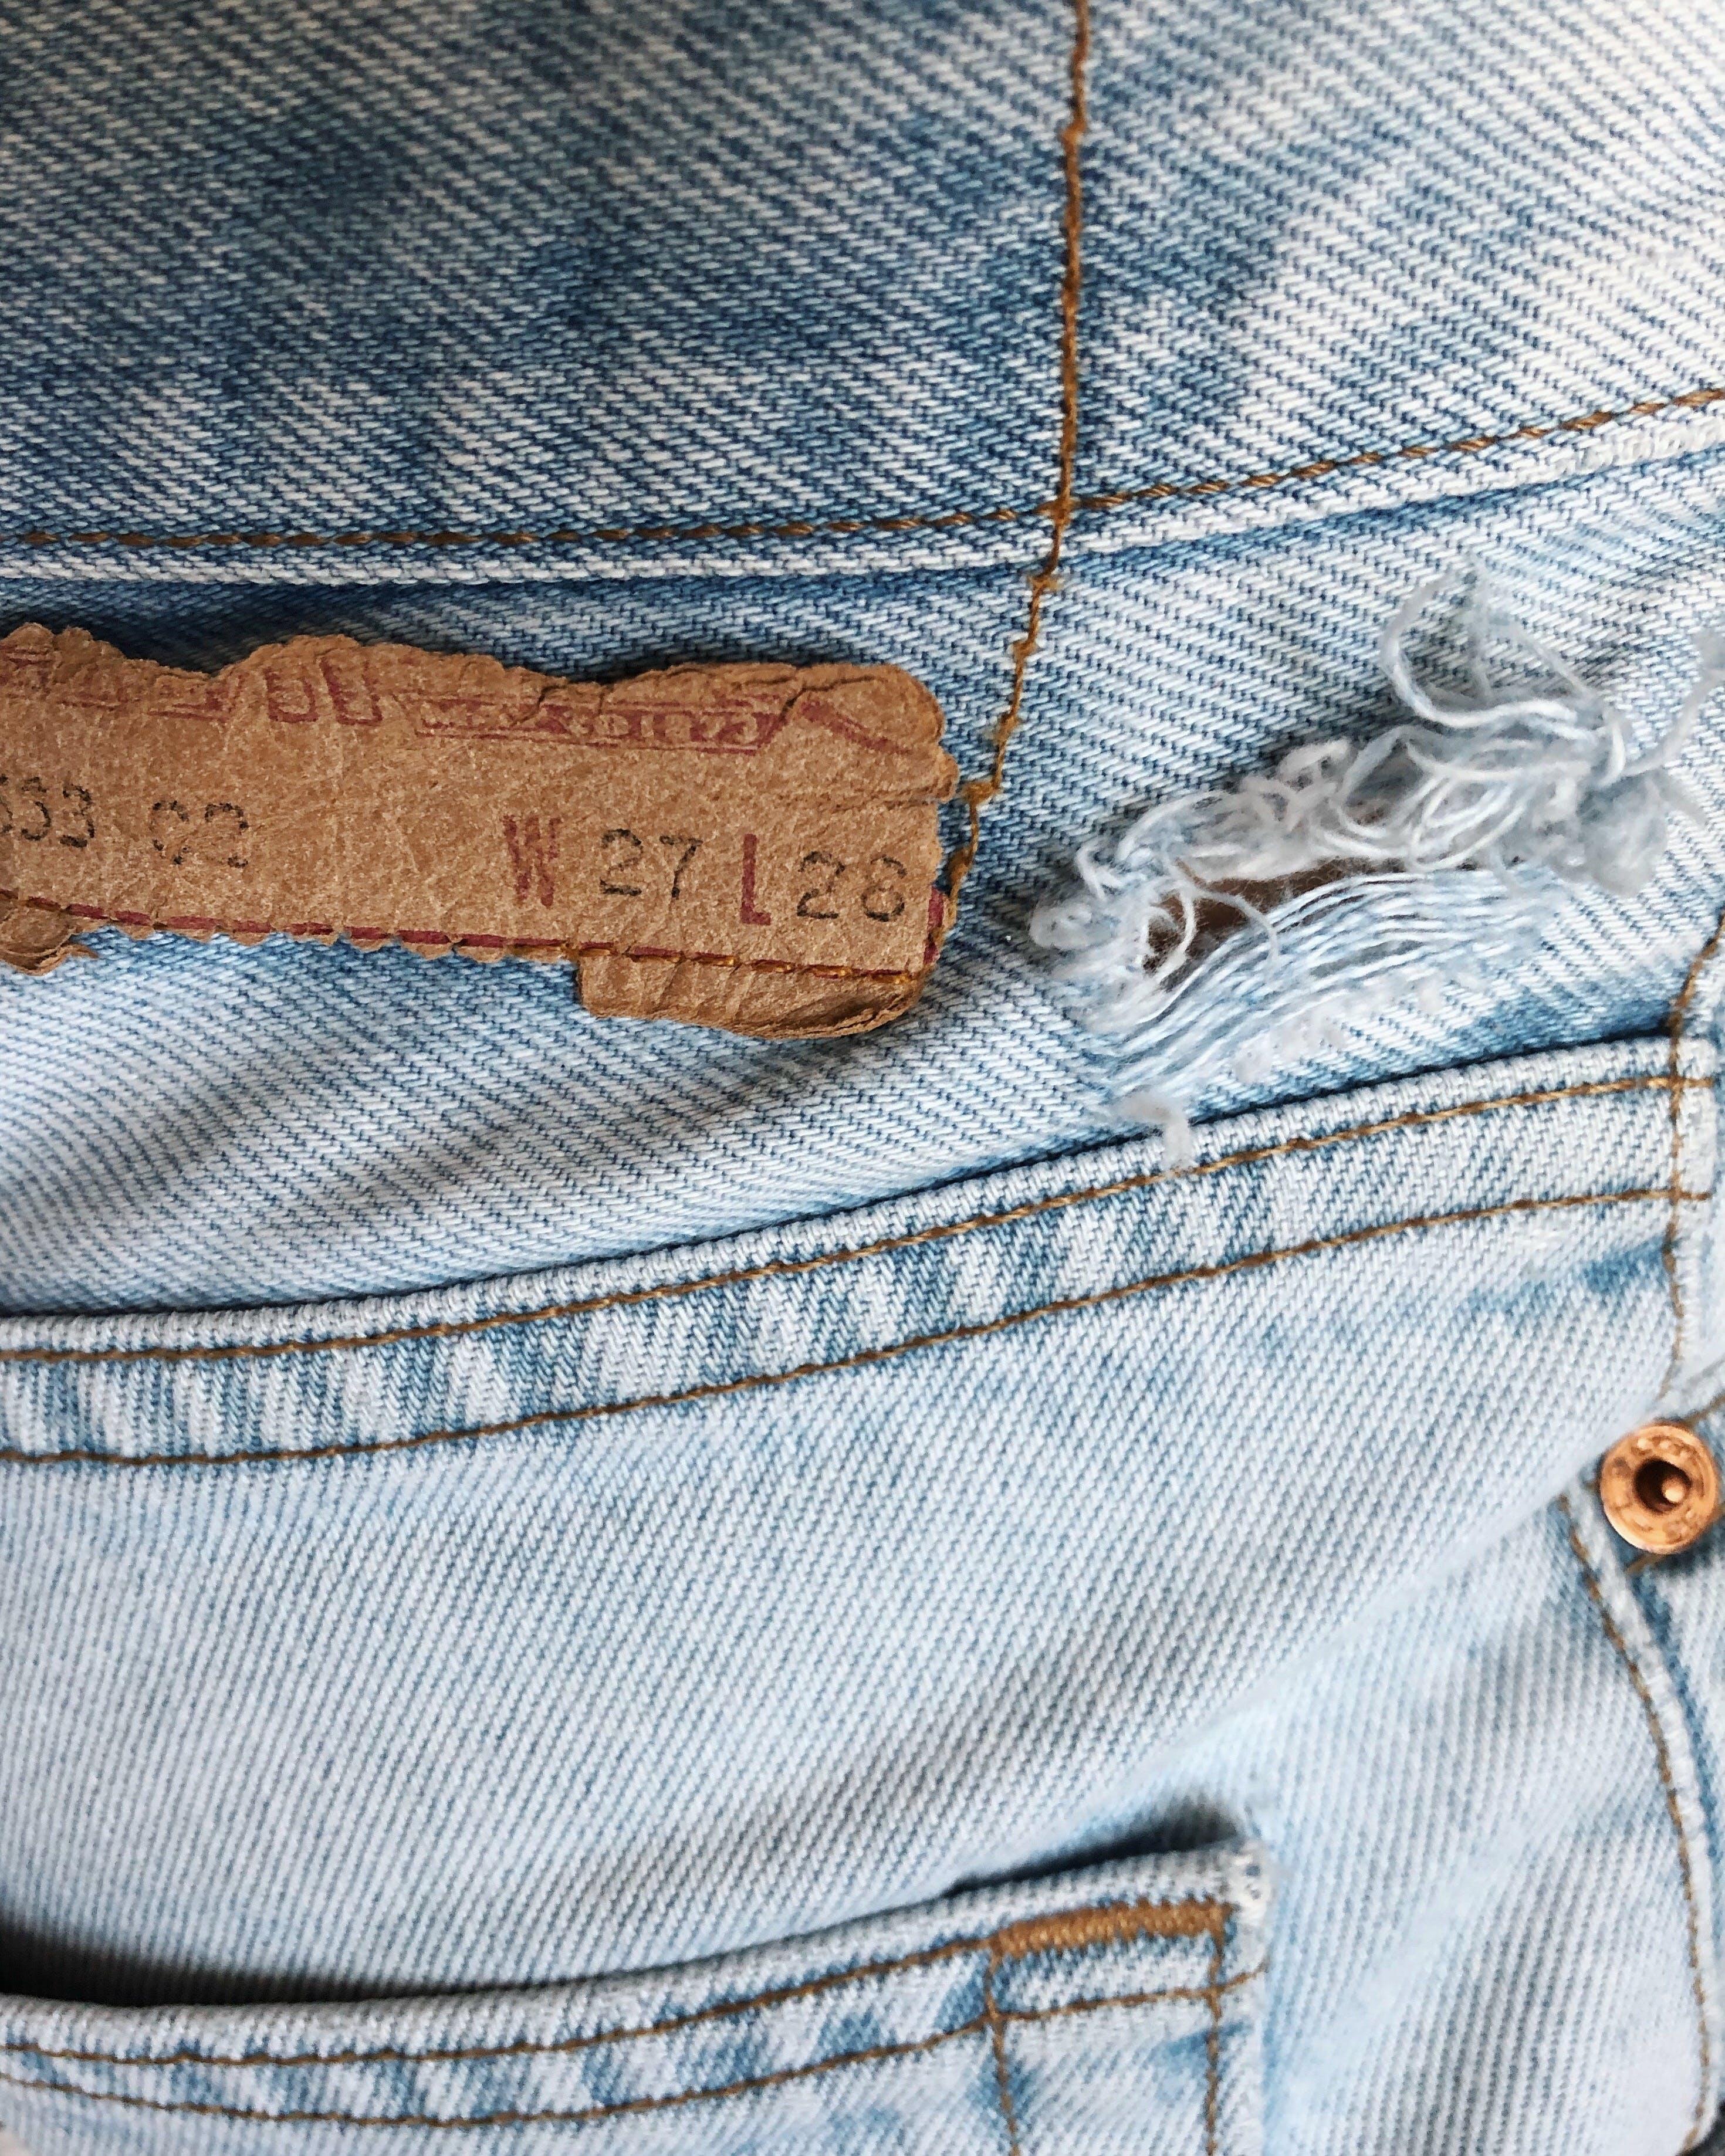 Kostnadsfri bild av denim, denimjeans, ha på sig, jeans